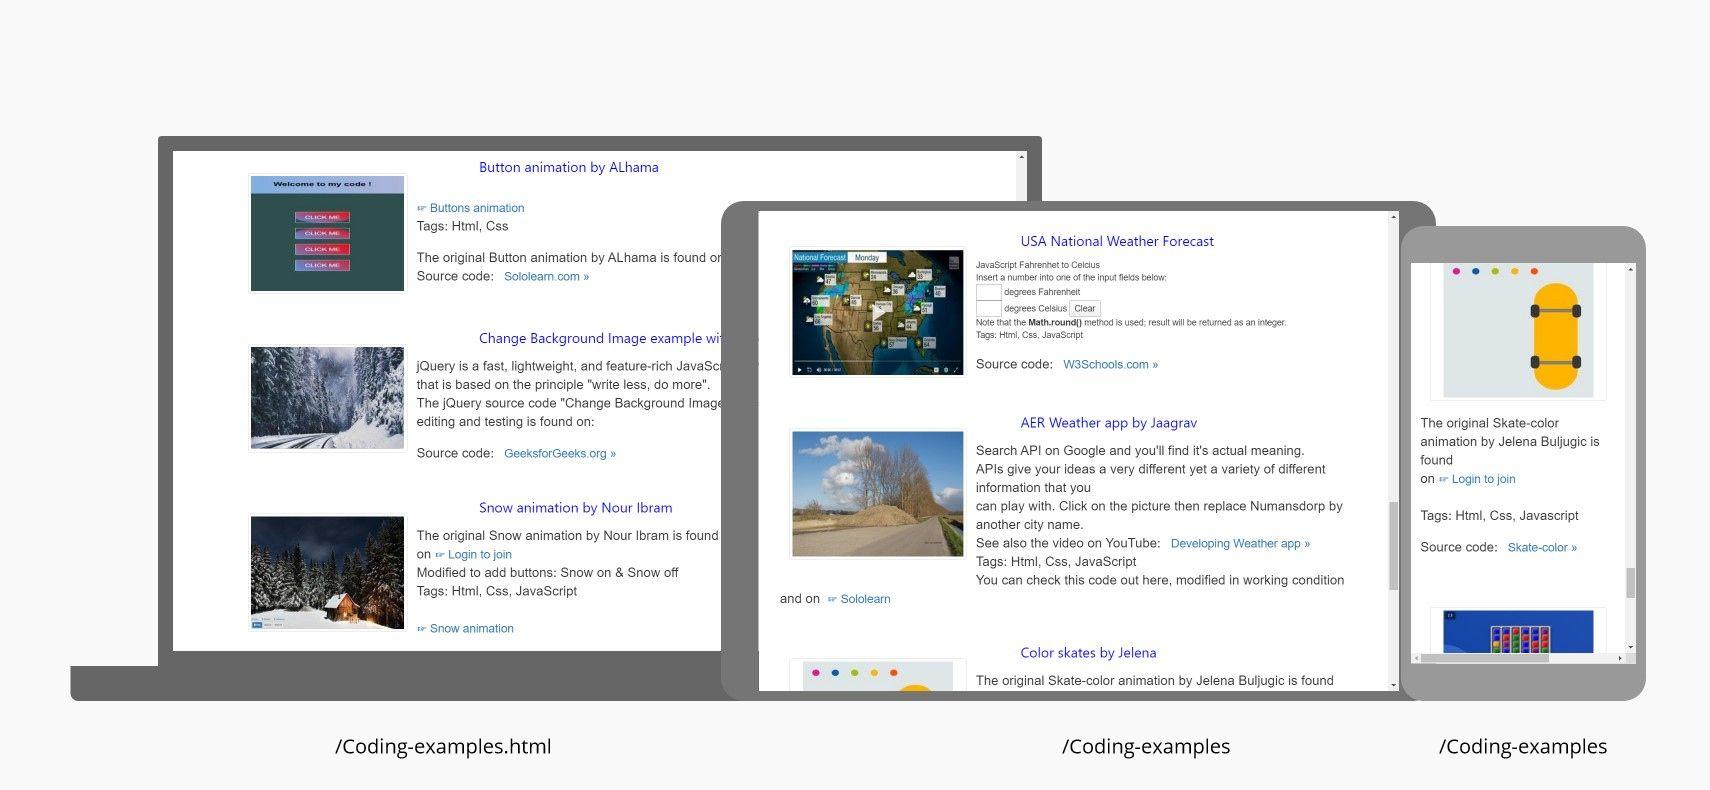 Coding-examples - Coding-examples - Coding-examples